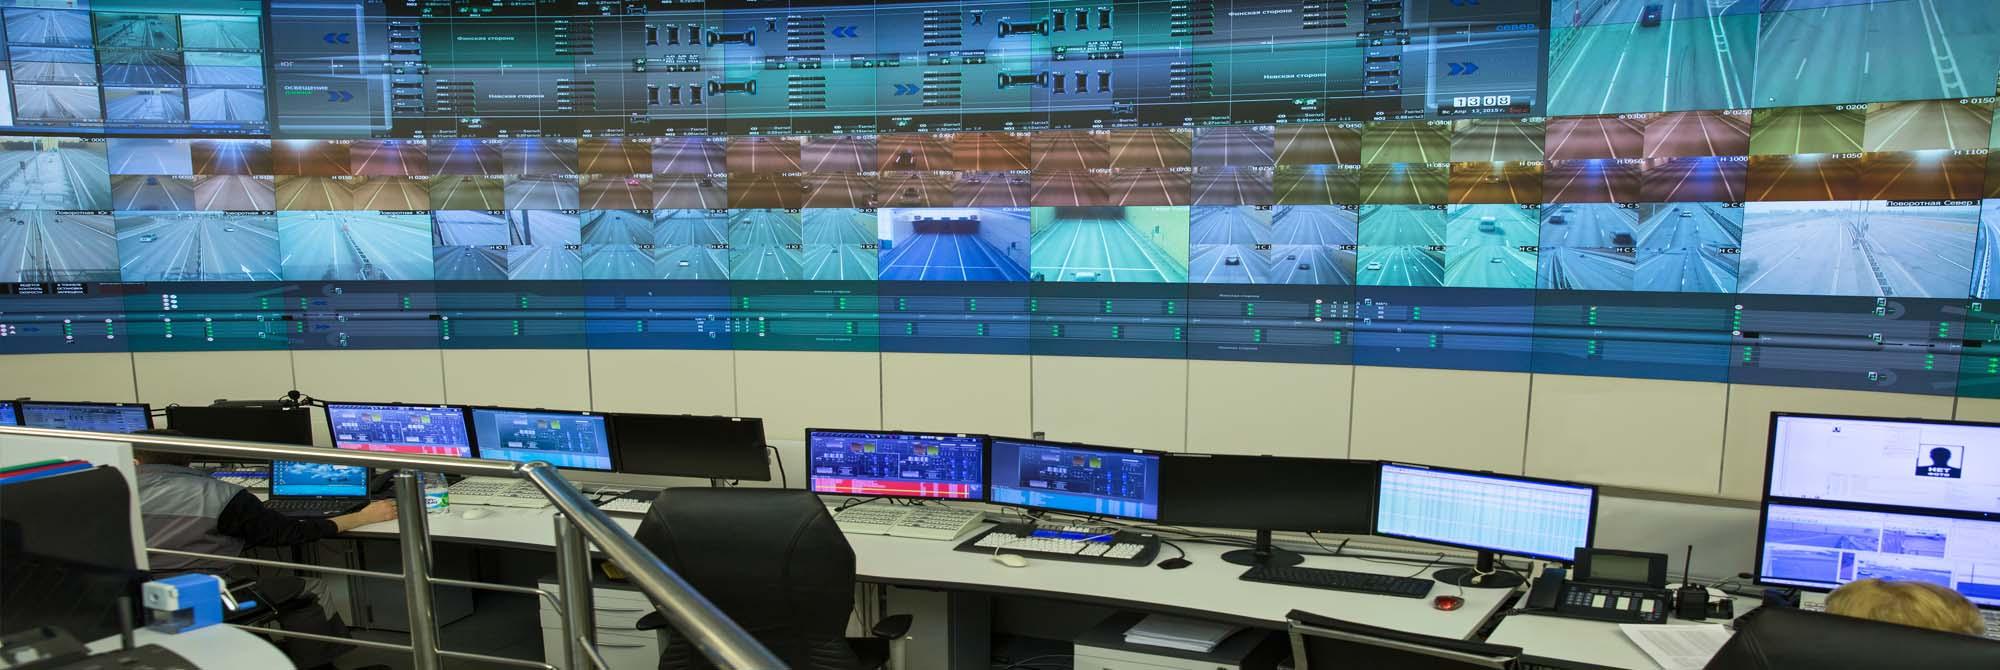 Visec Control Center